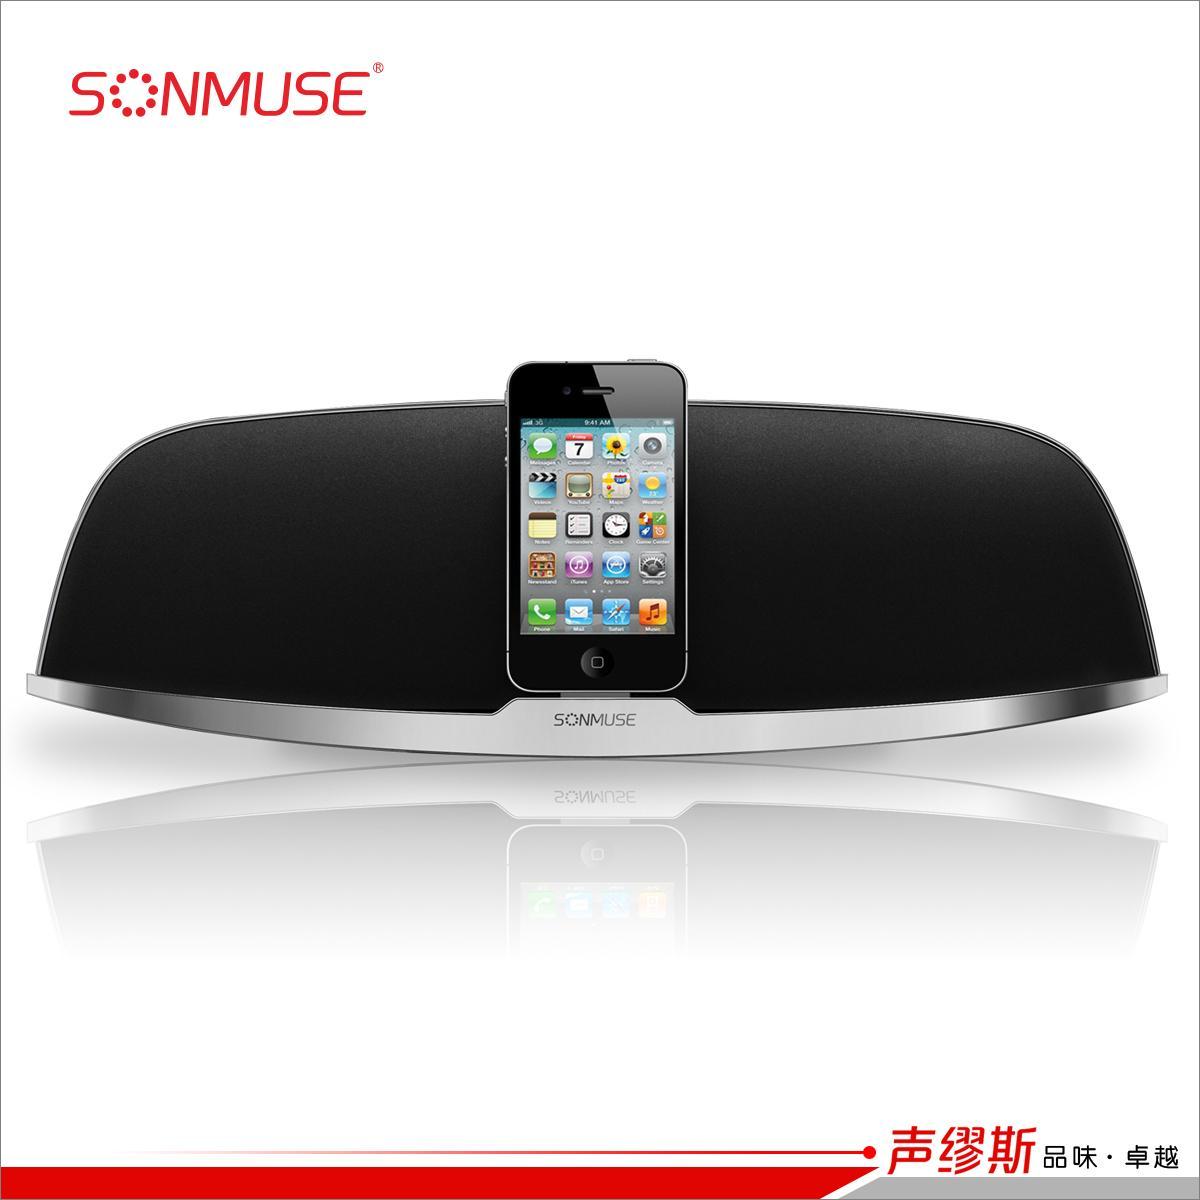 Apple портативная колонка Sonmuse D6 Iphone Ipod Apple